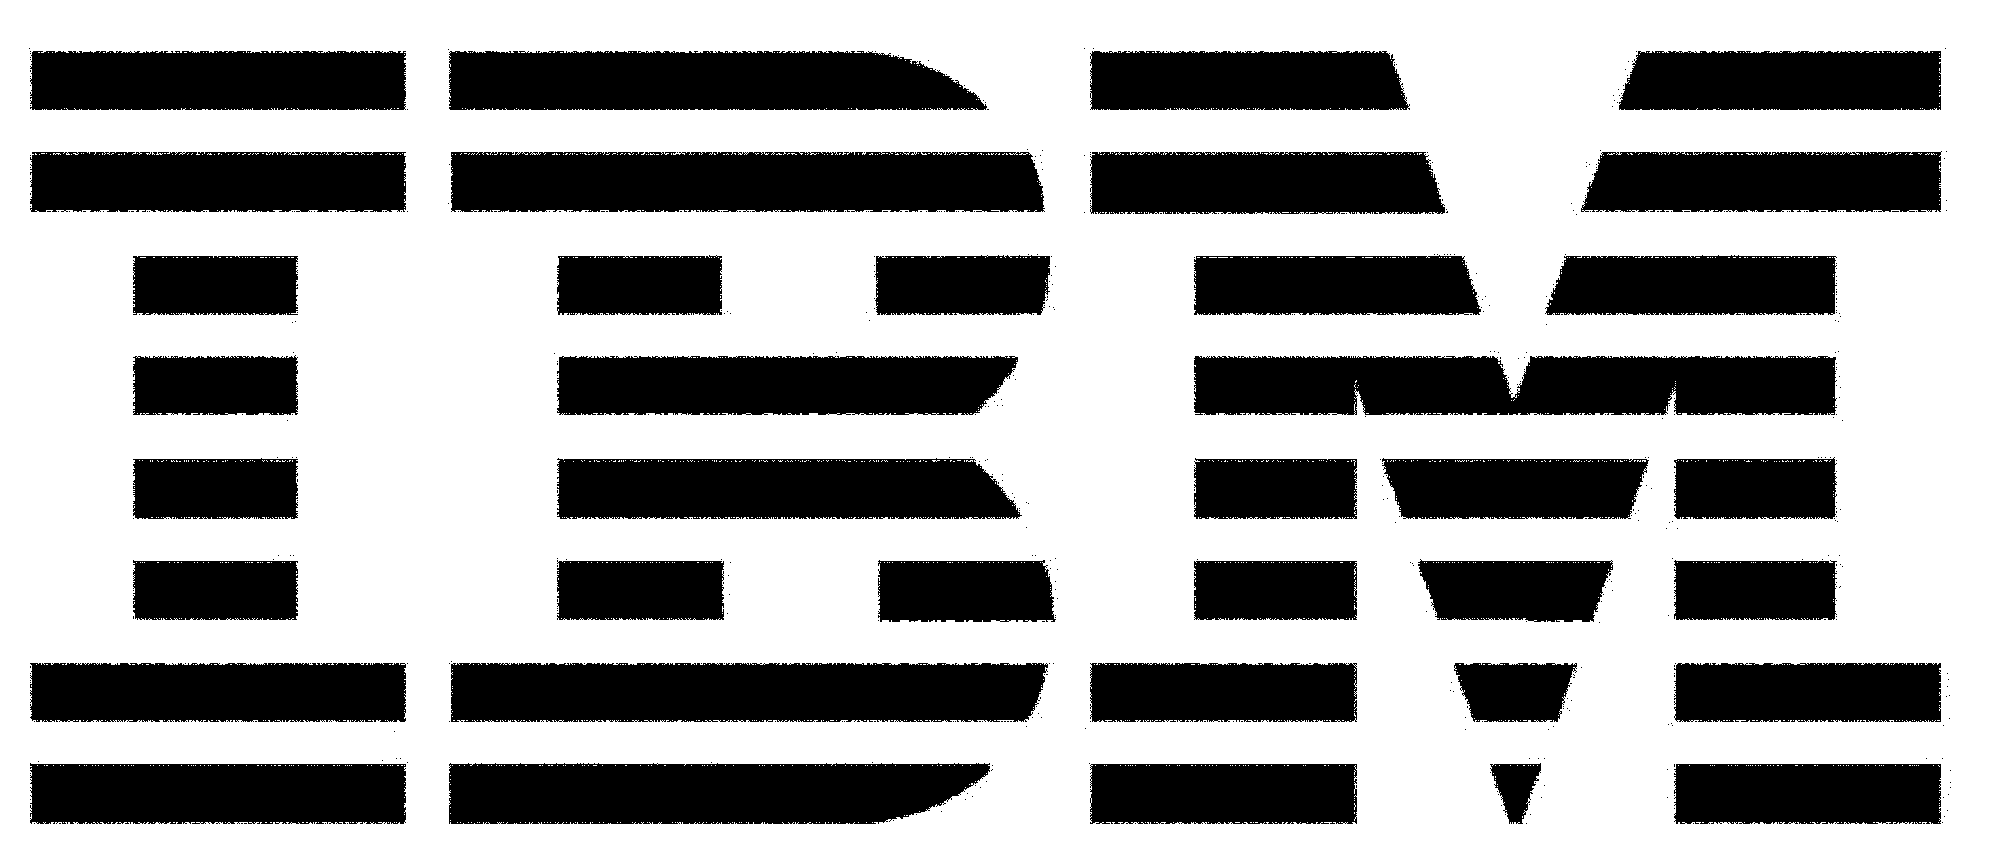 http://kapssolutions.com/wp-content/uploads/2018/08/IBM-Logo.png